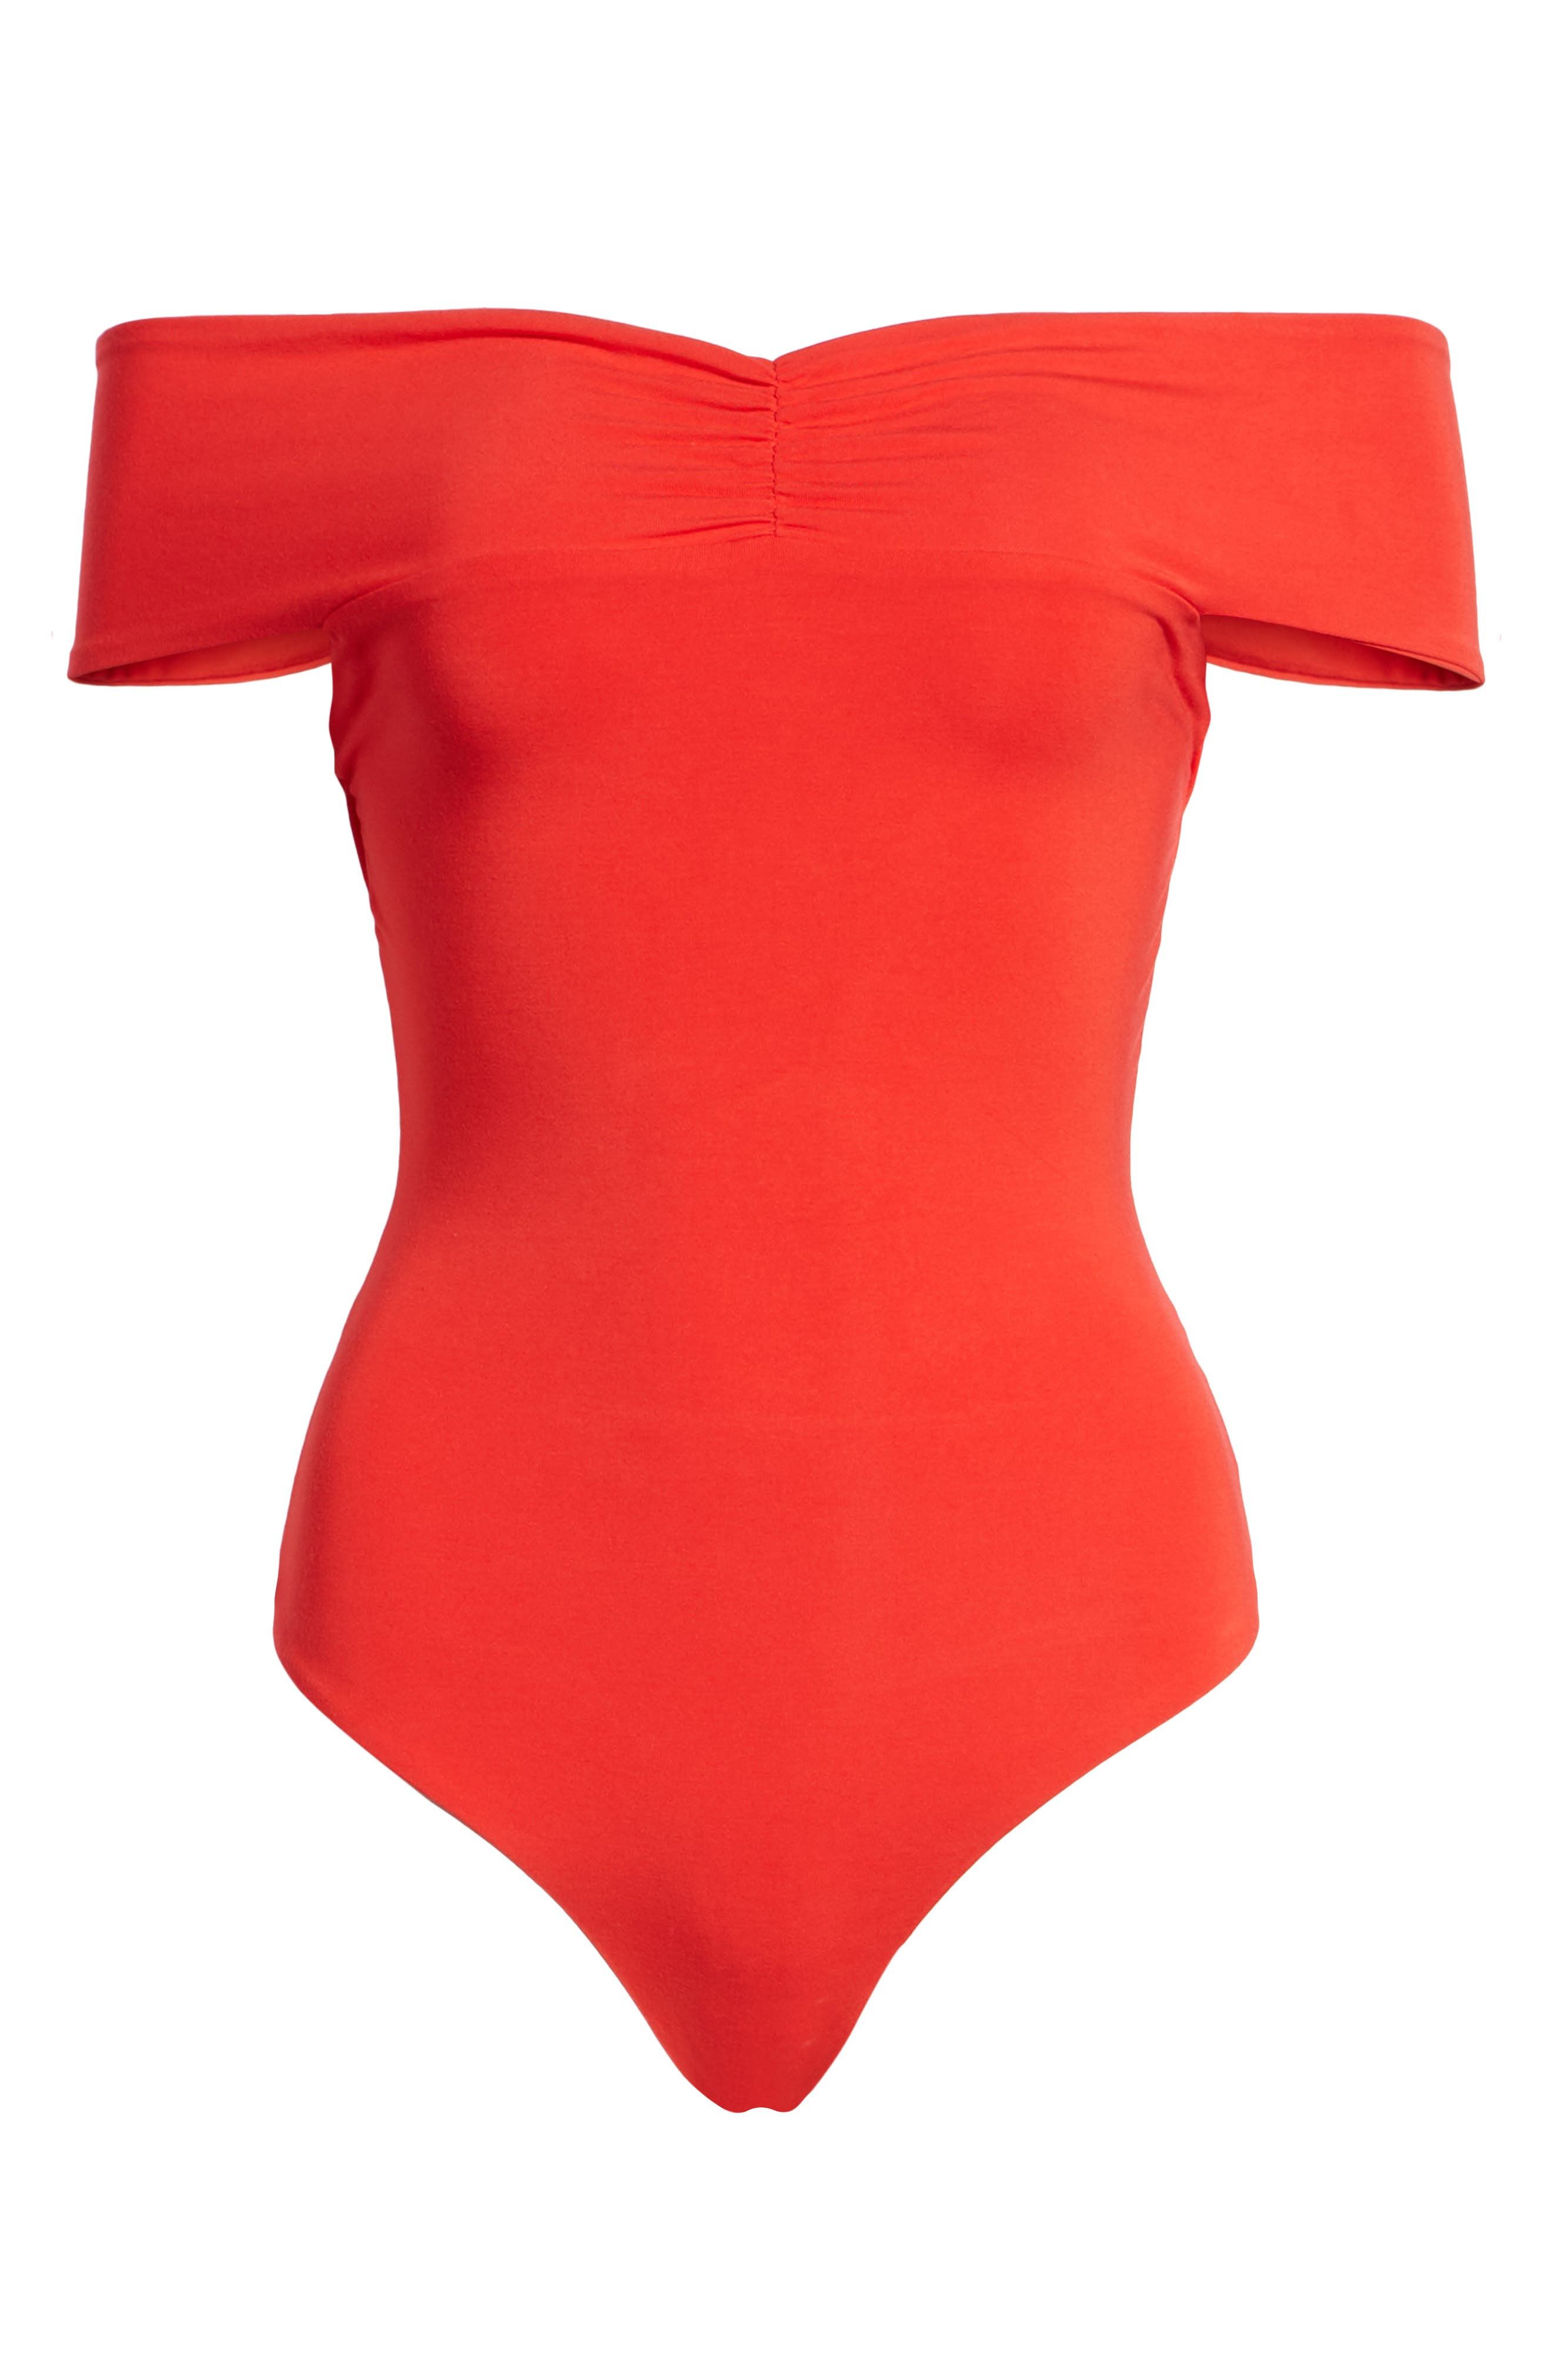 Neil Off the Shoulder Bodysuit,                             Alternate thumbnail 6, color,                             Red